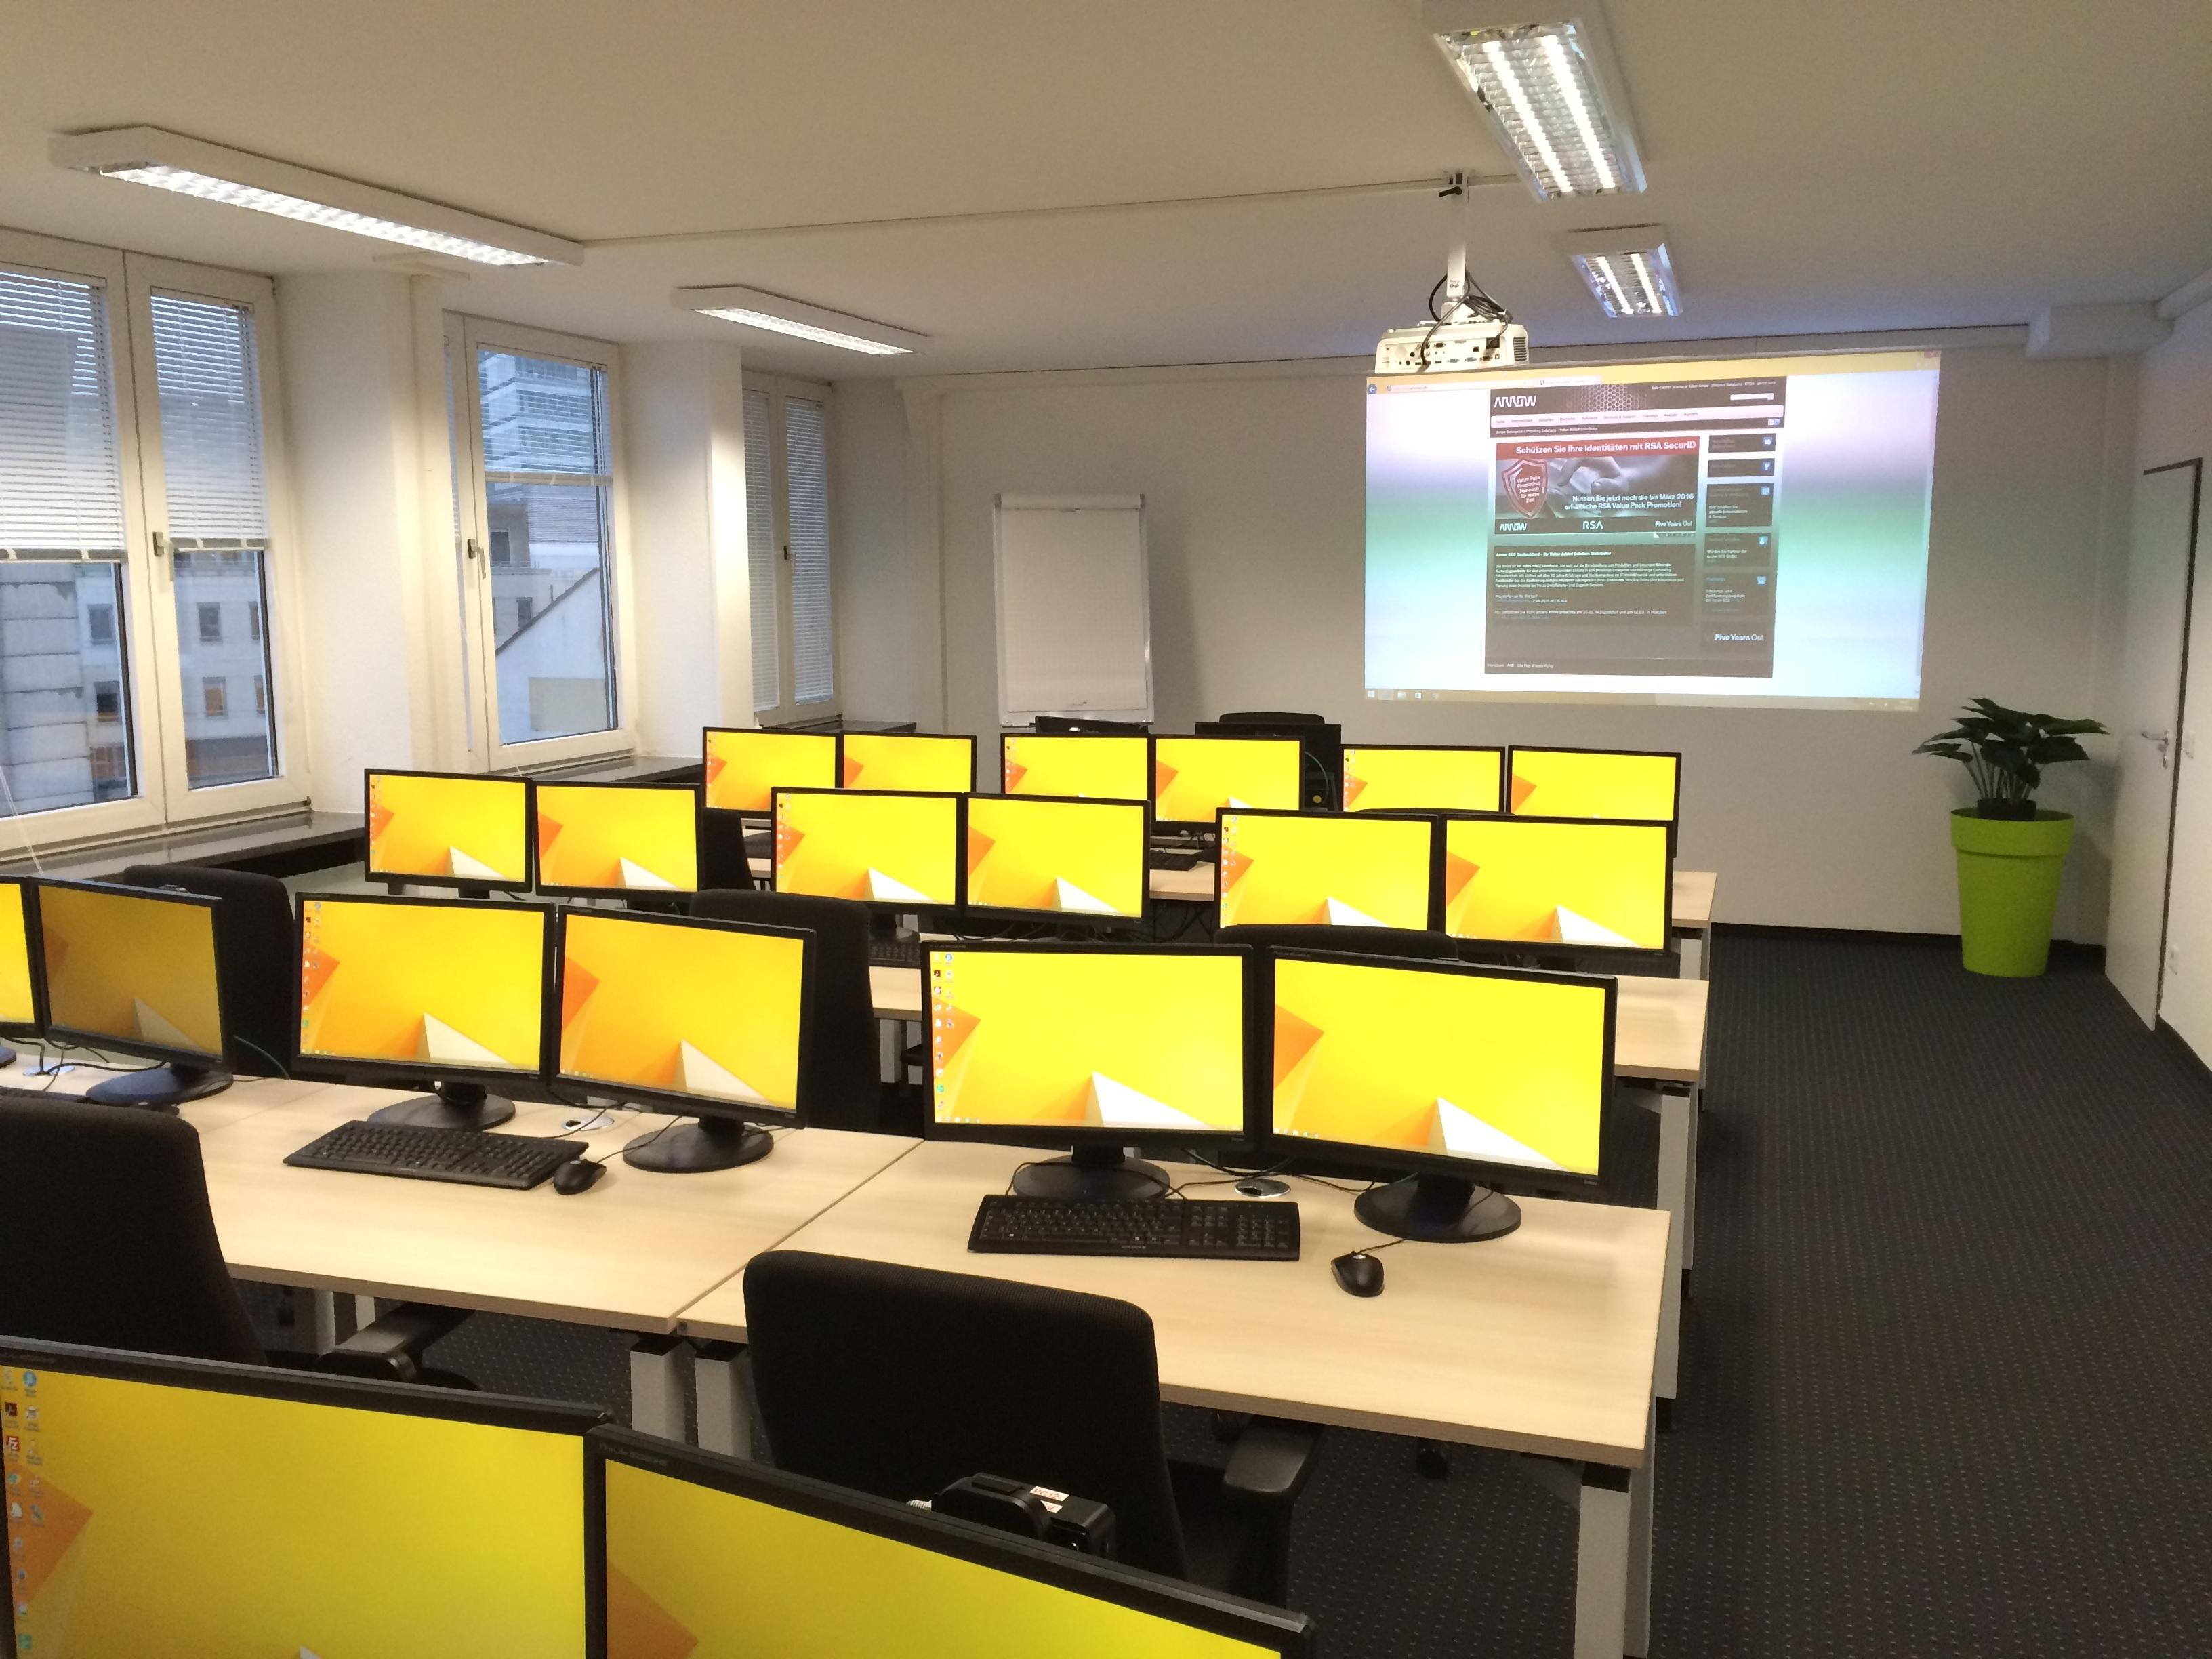 Classroom Technology Design ~ รูปภาพ หอประชุม การประชุม สำนักงาน ห้องพัก ห้องเรียน